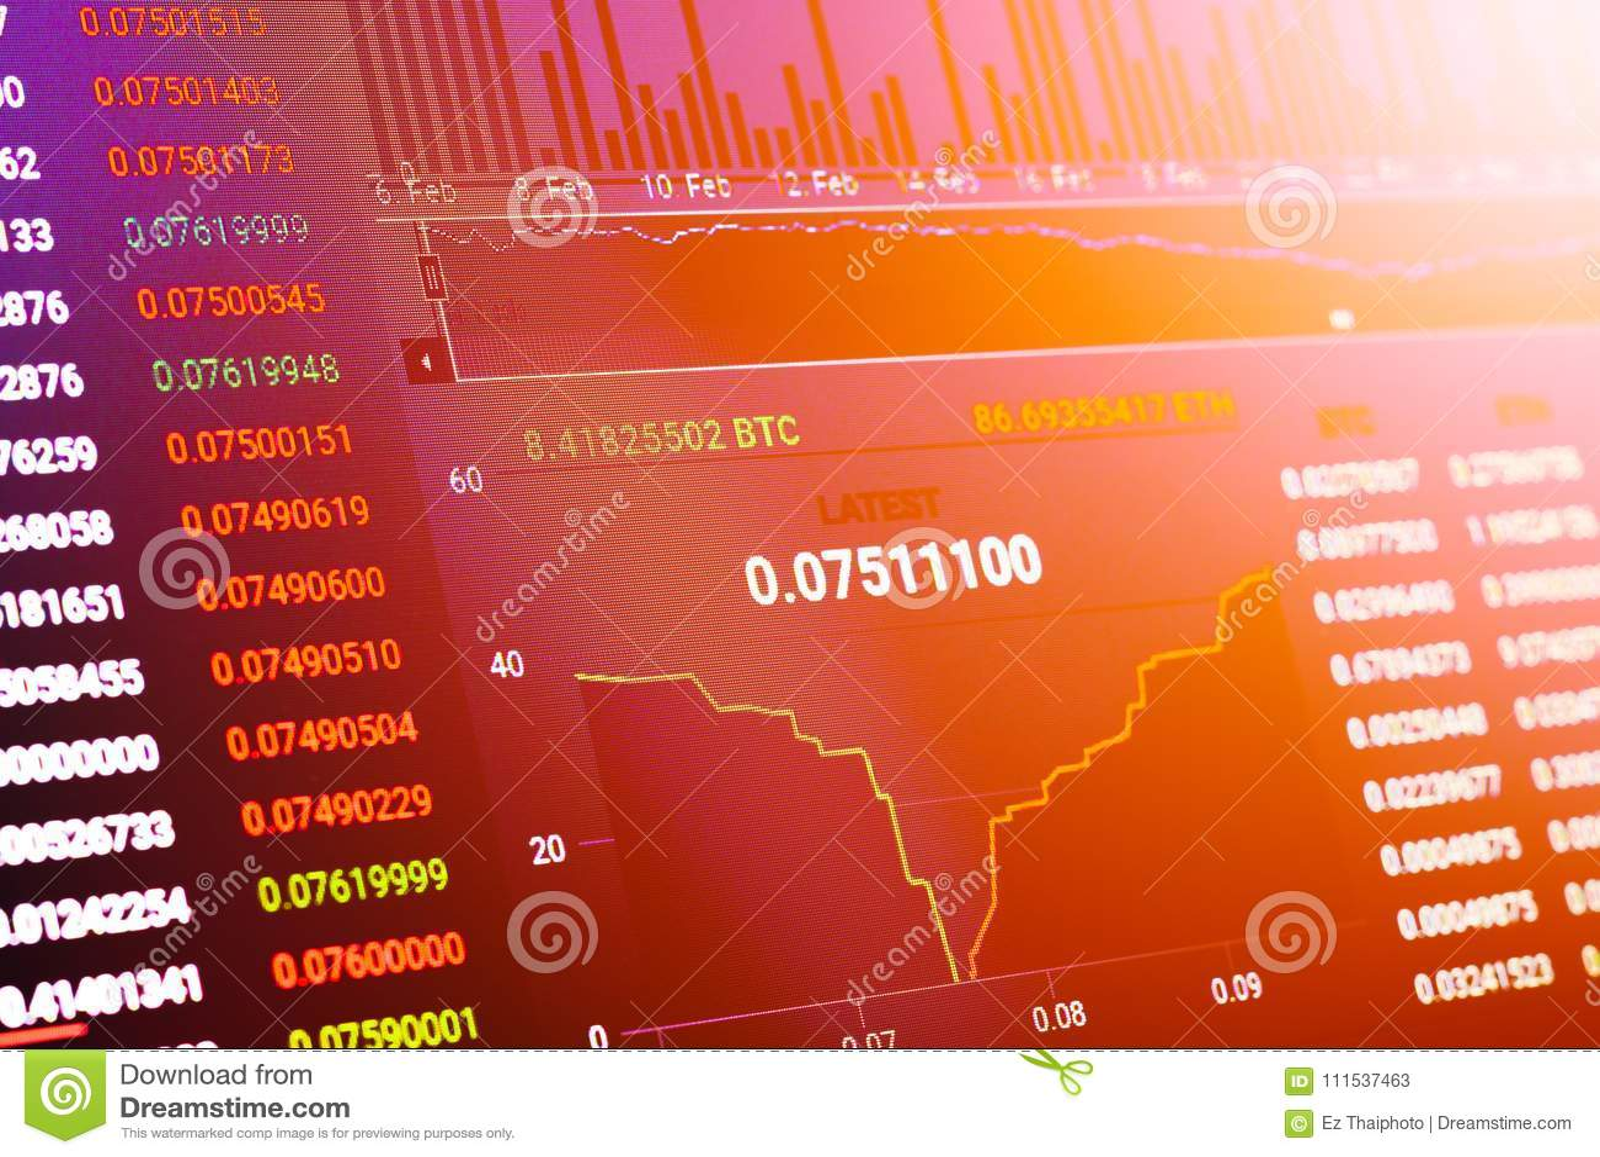 cryptocurrency btc market